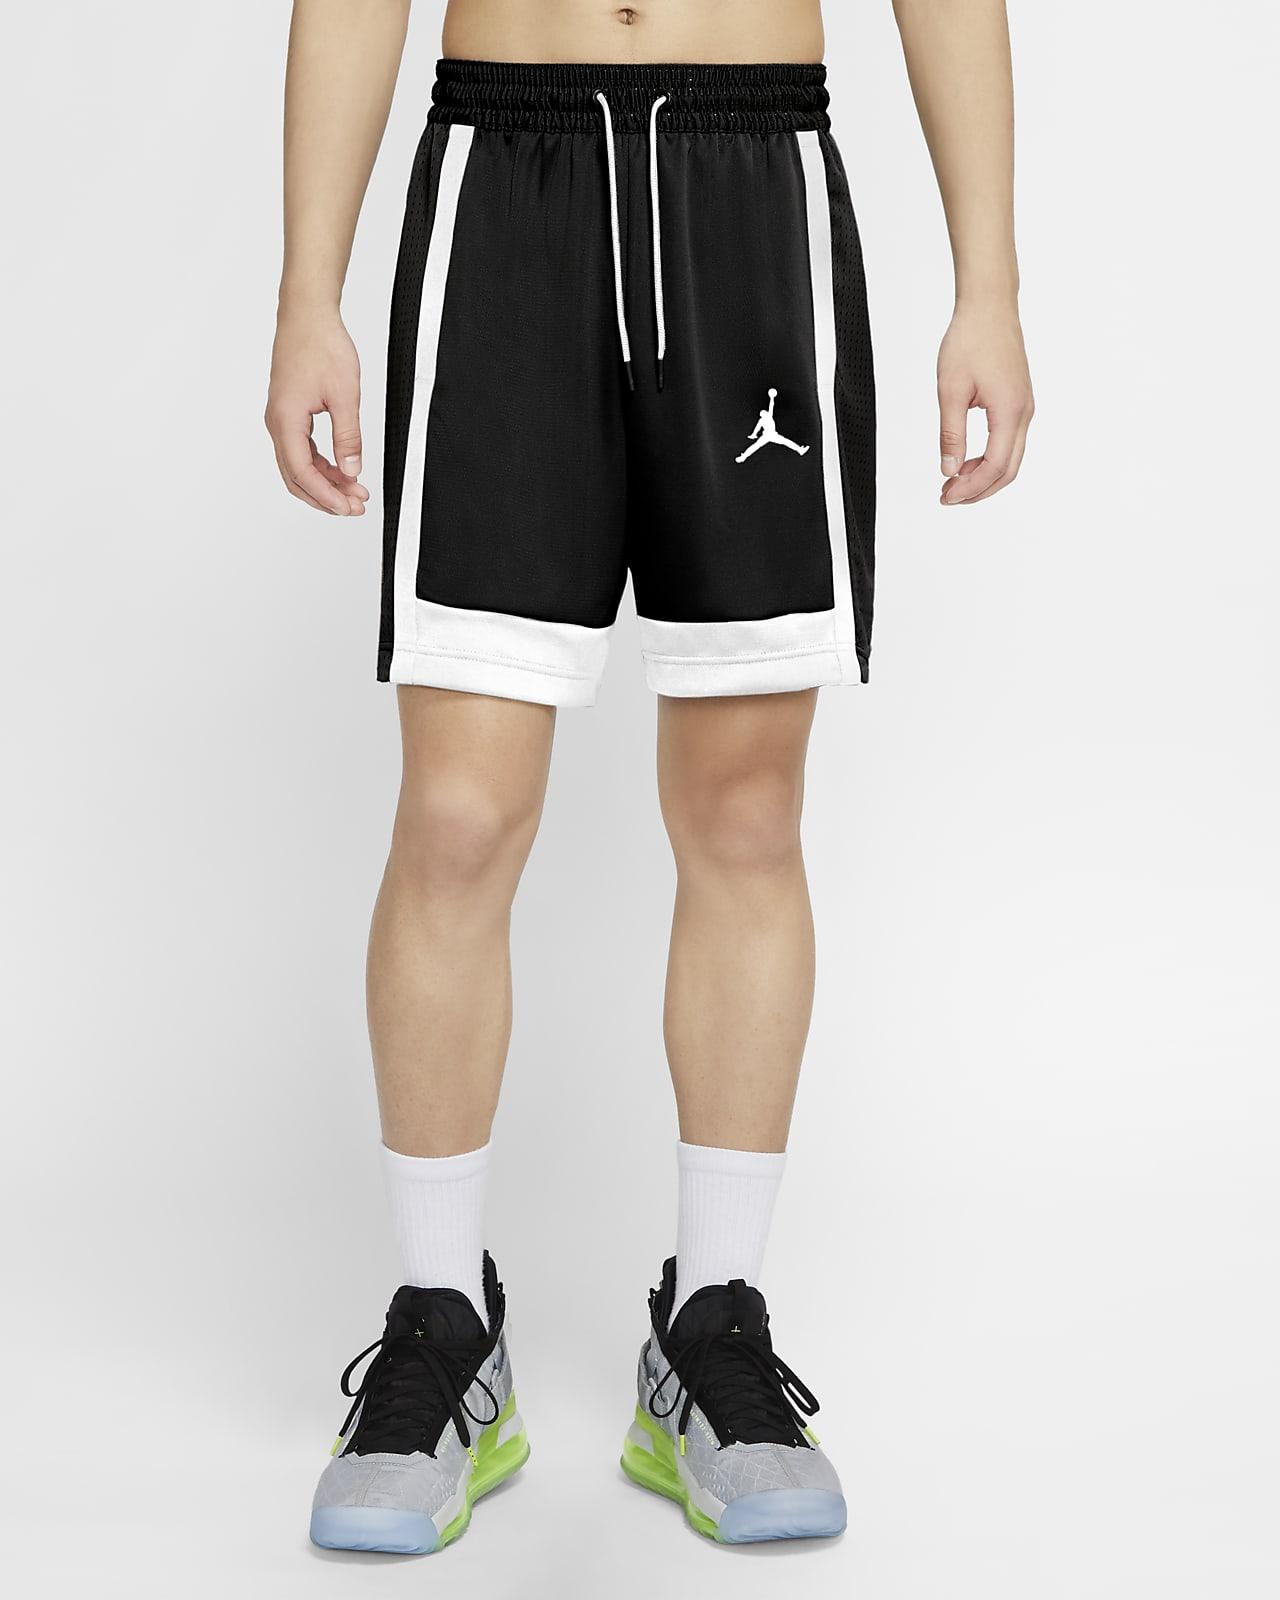 Jordan Air Men's Basketball Shorts